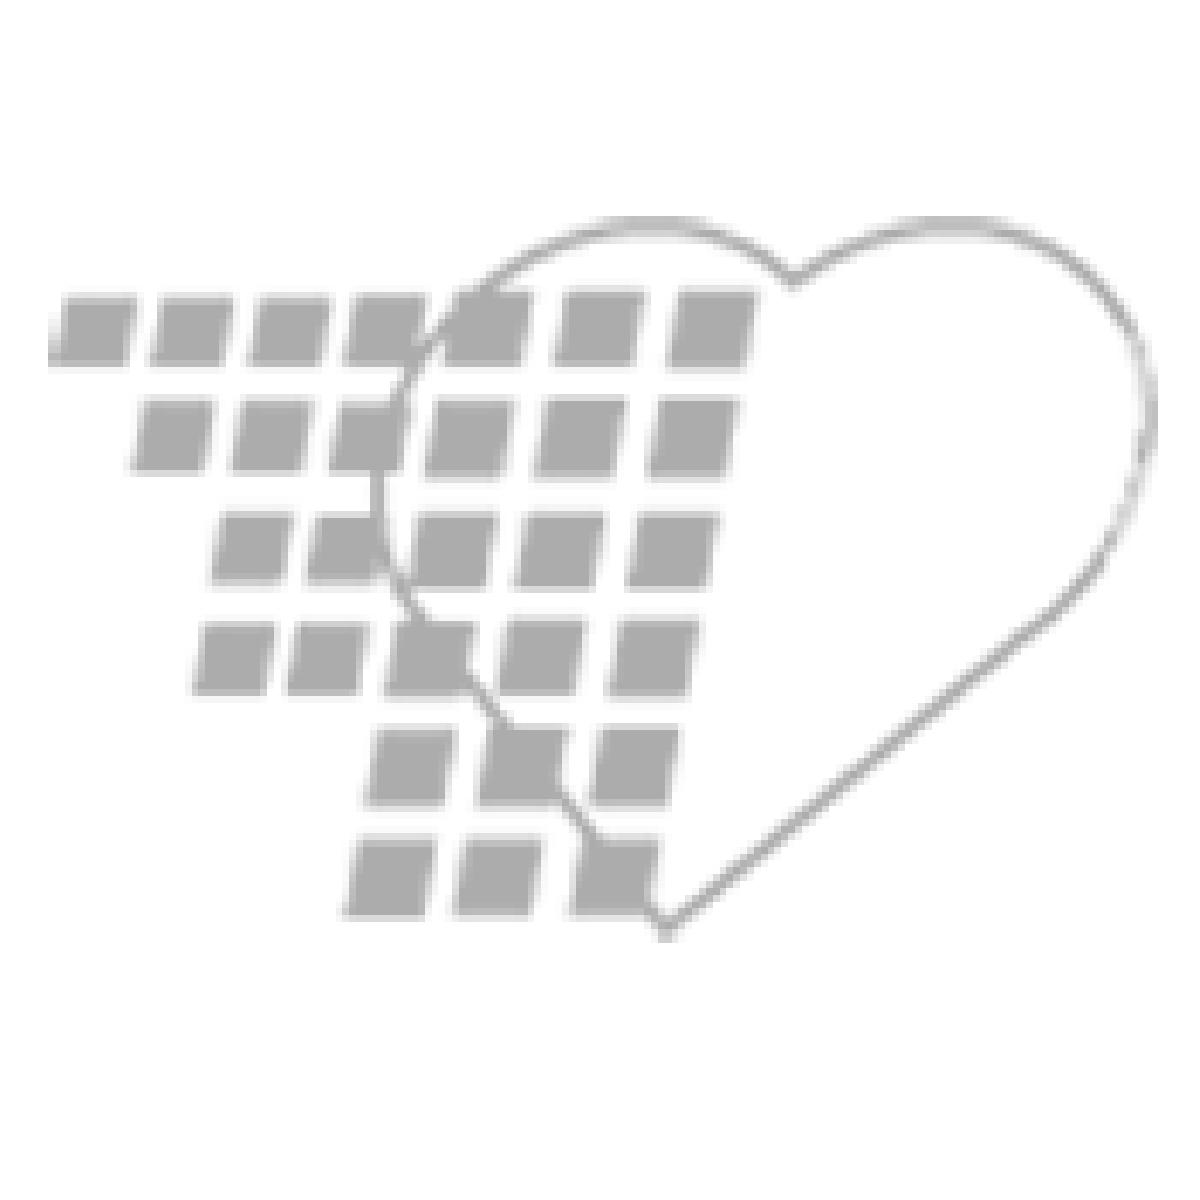 06-82-5053 - Tension Pneumothorax Access Kit (TPAK)